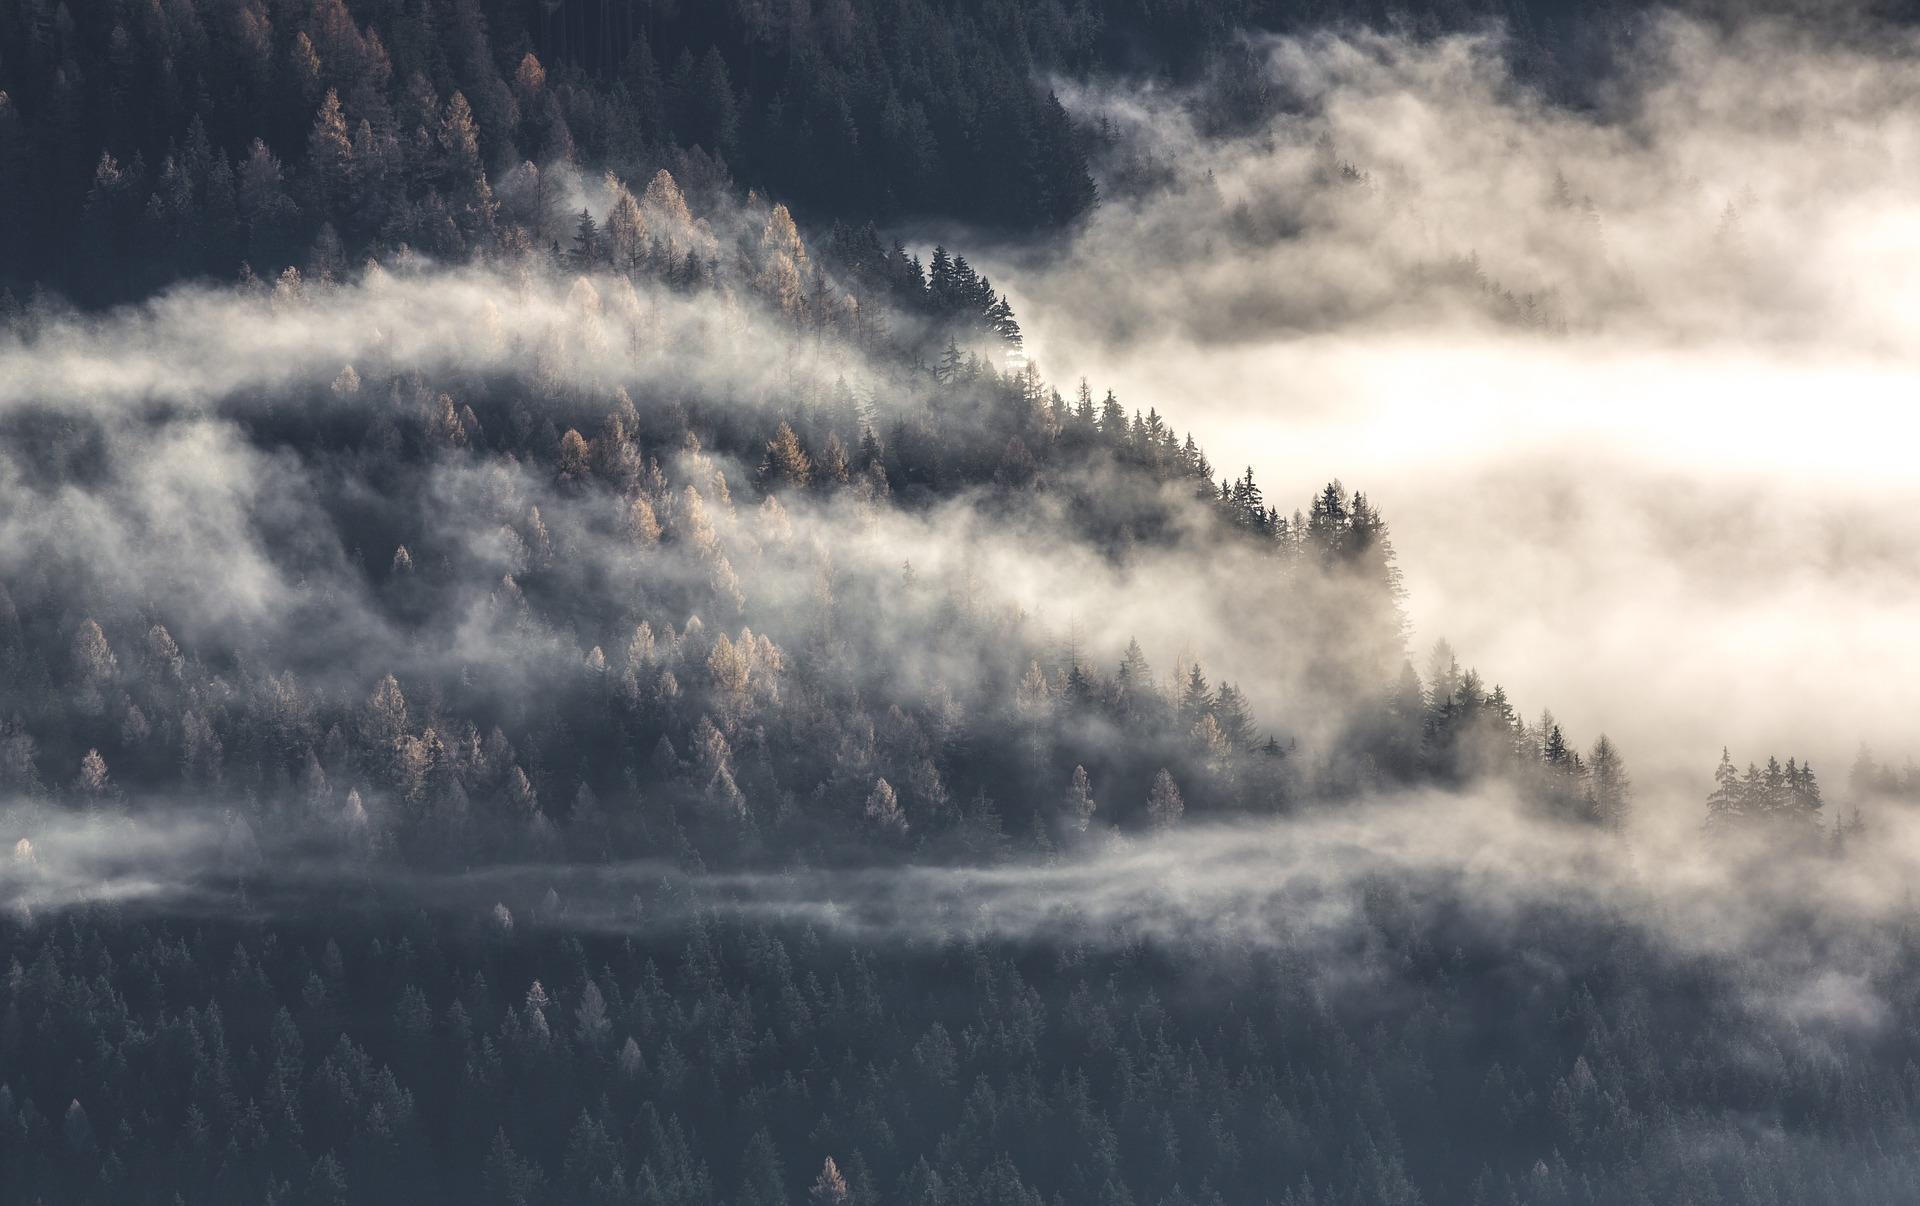 foggy atmosphere